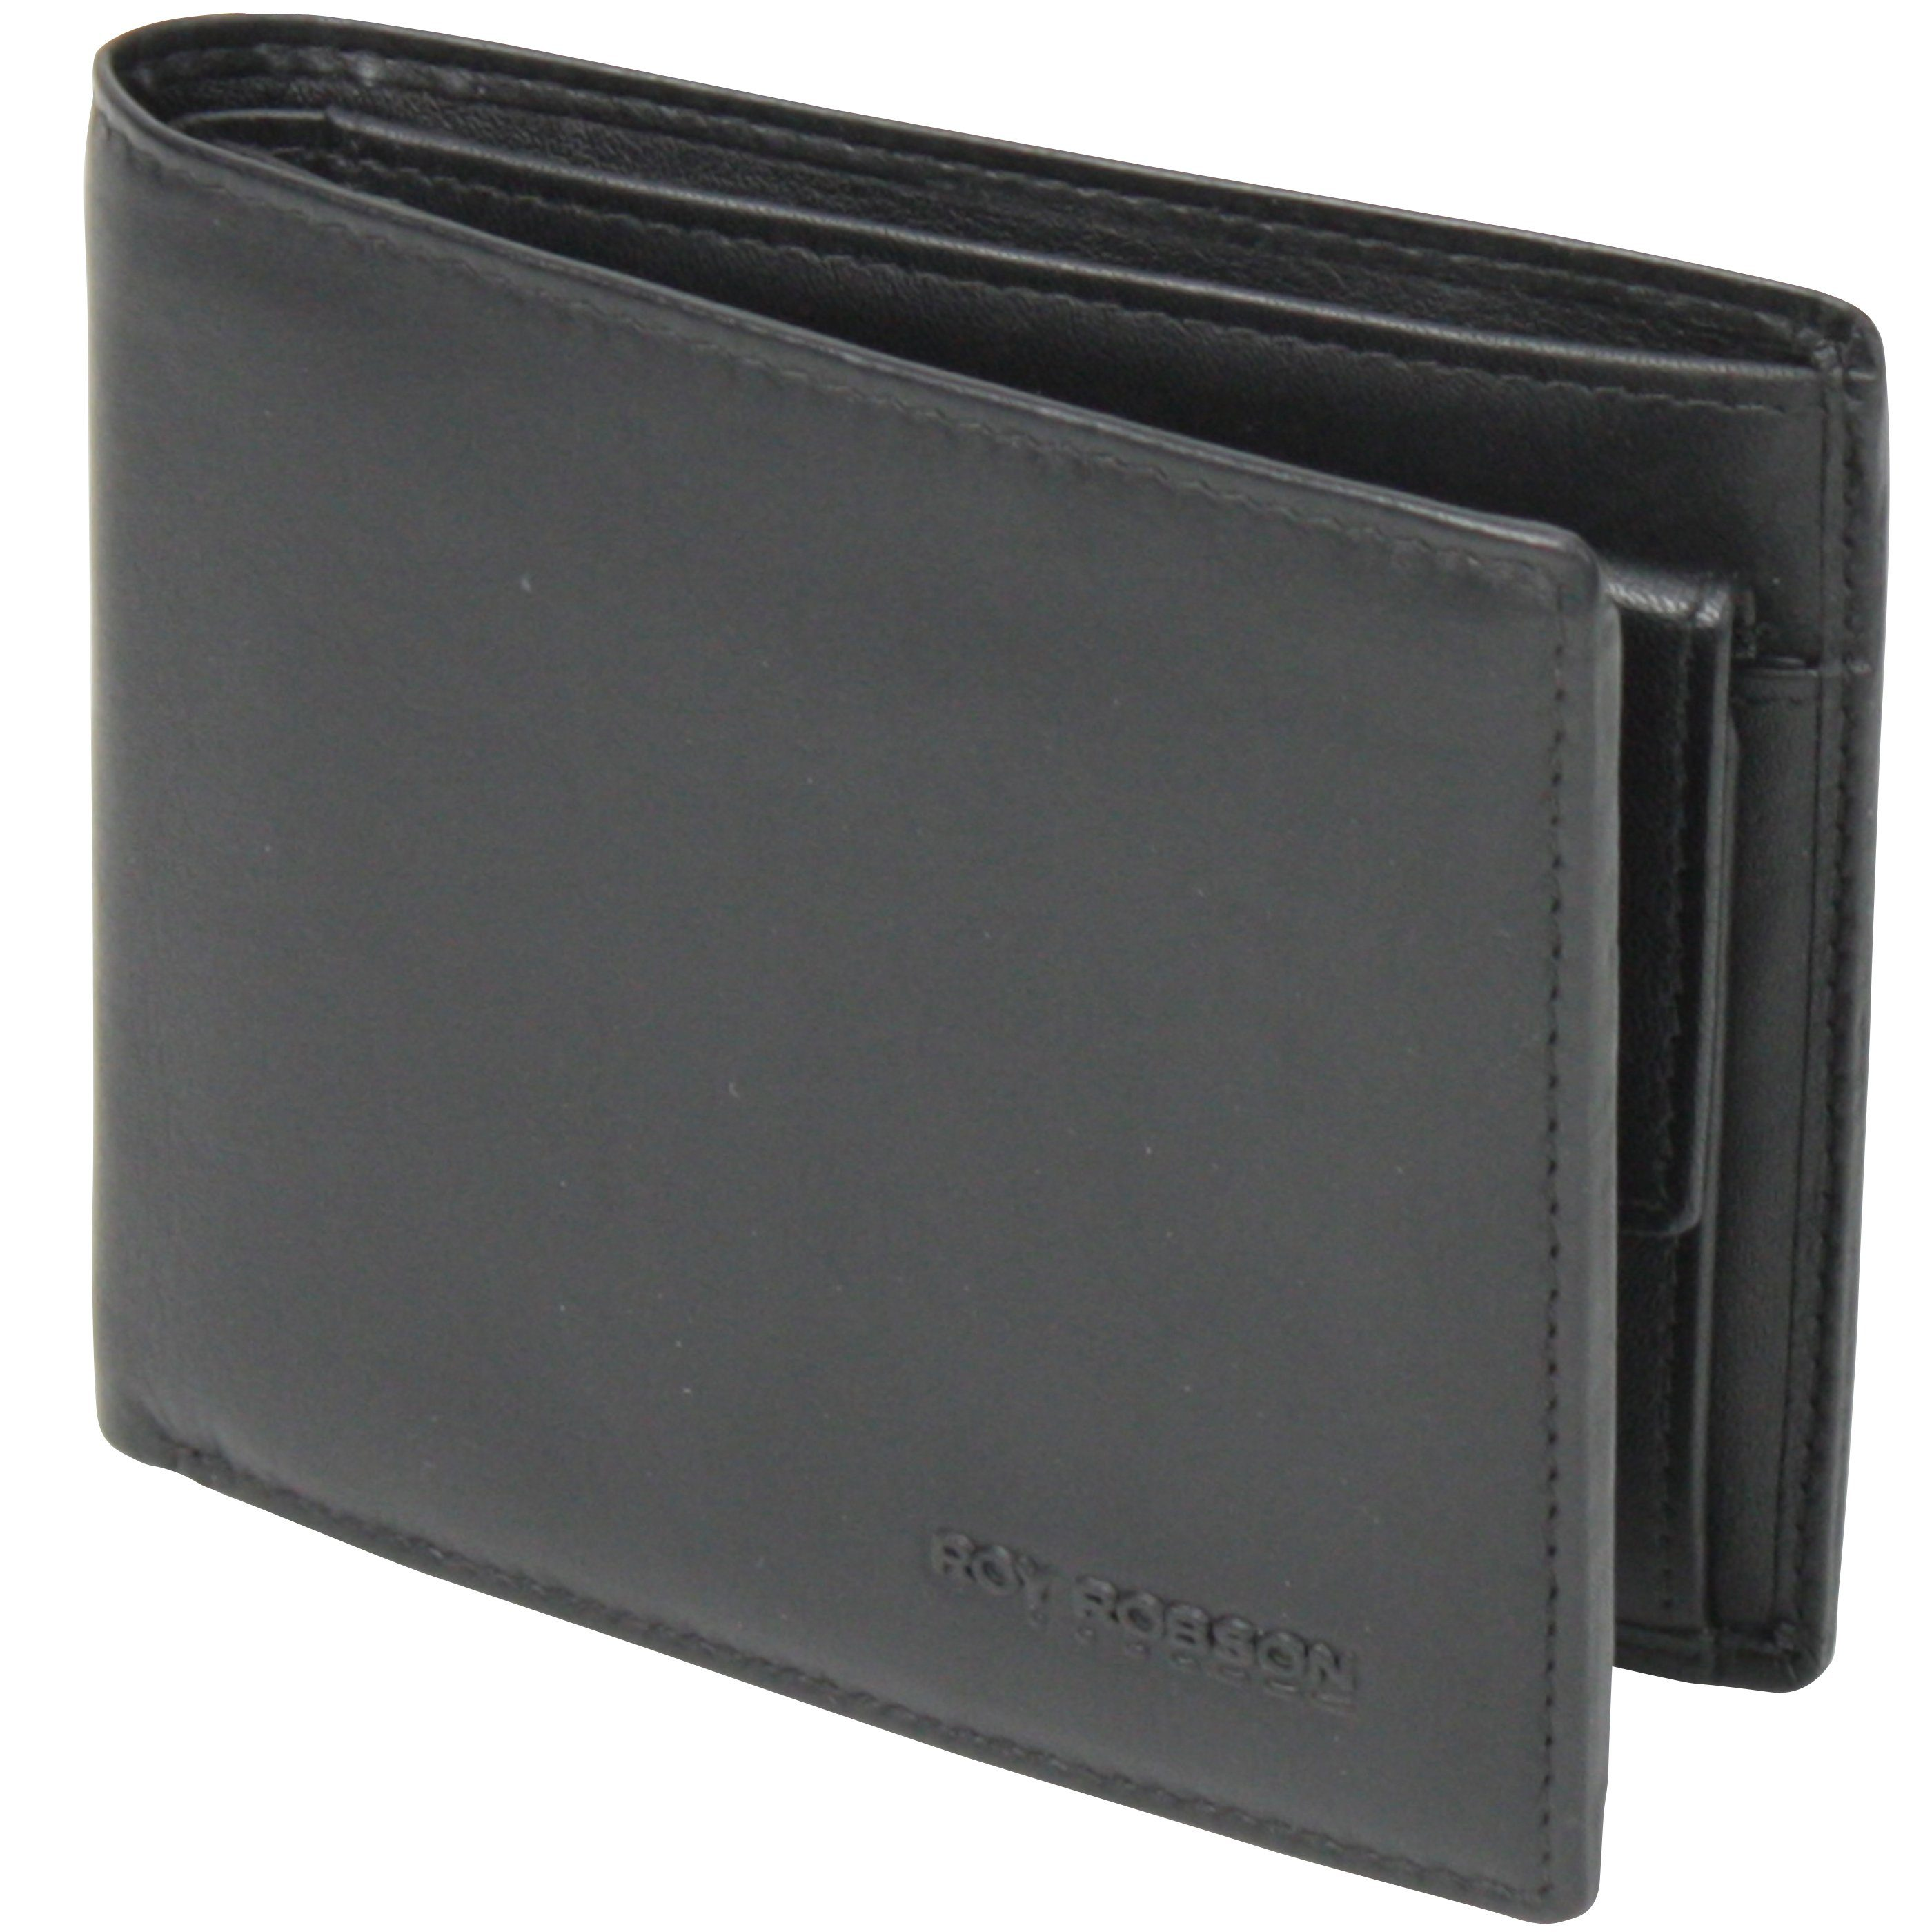 Roy Robson Enchant Geldbörse Leder 12 cm